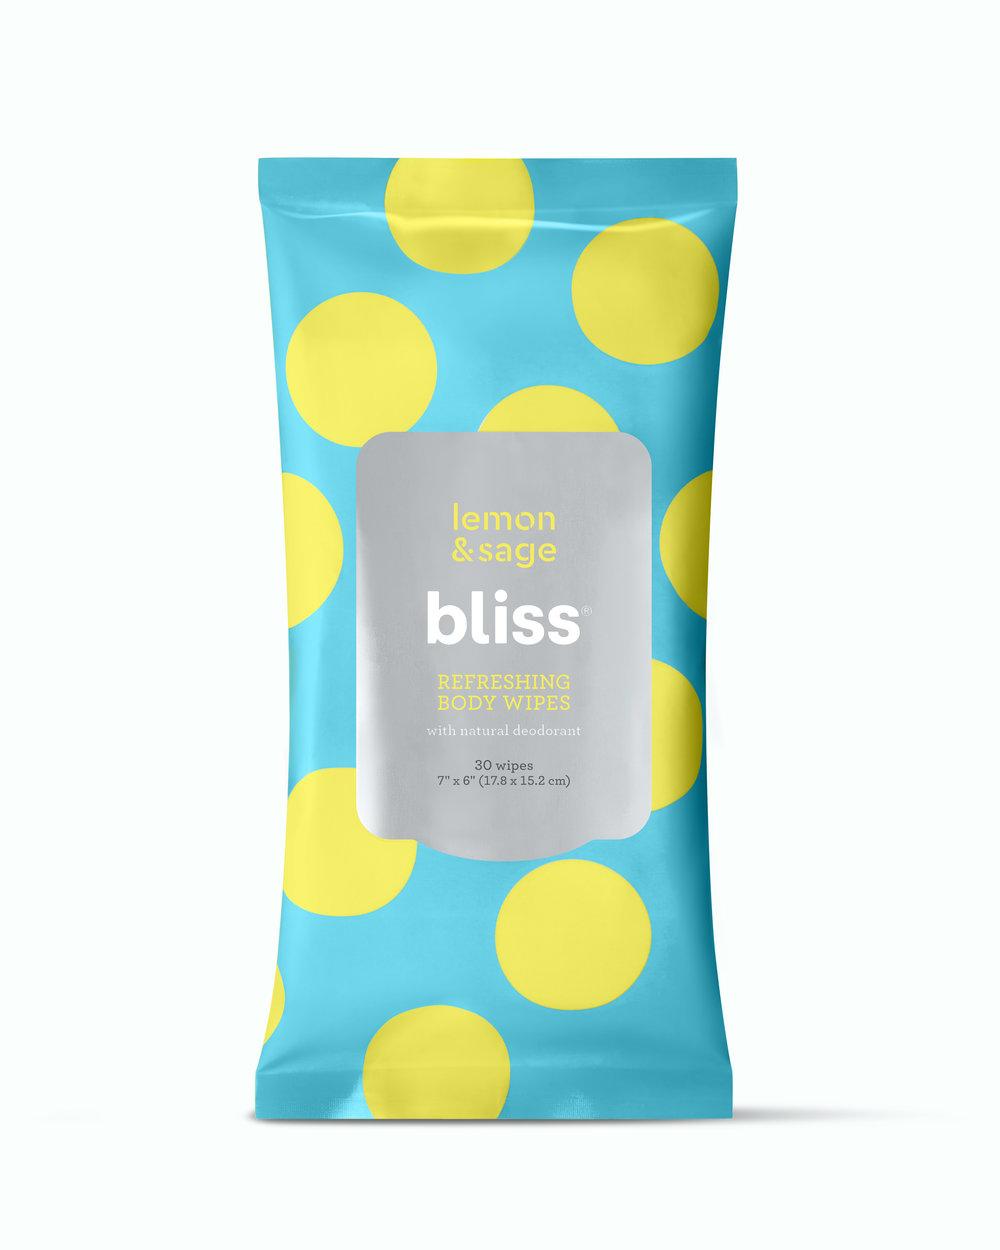 Bliss Lemon & Sage Refreshing Body Wipes.jpg